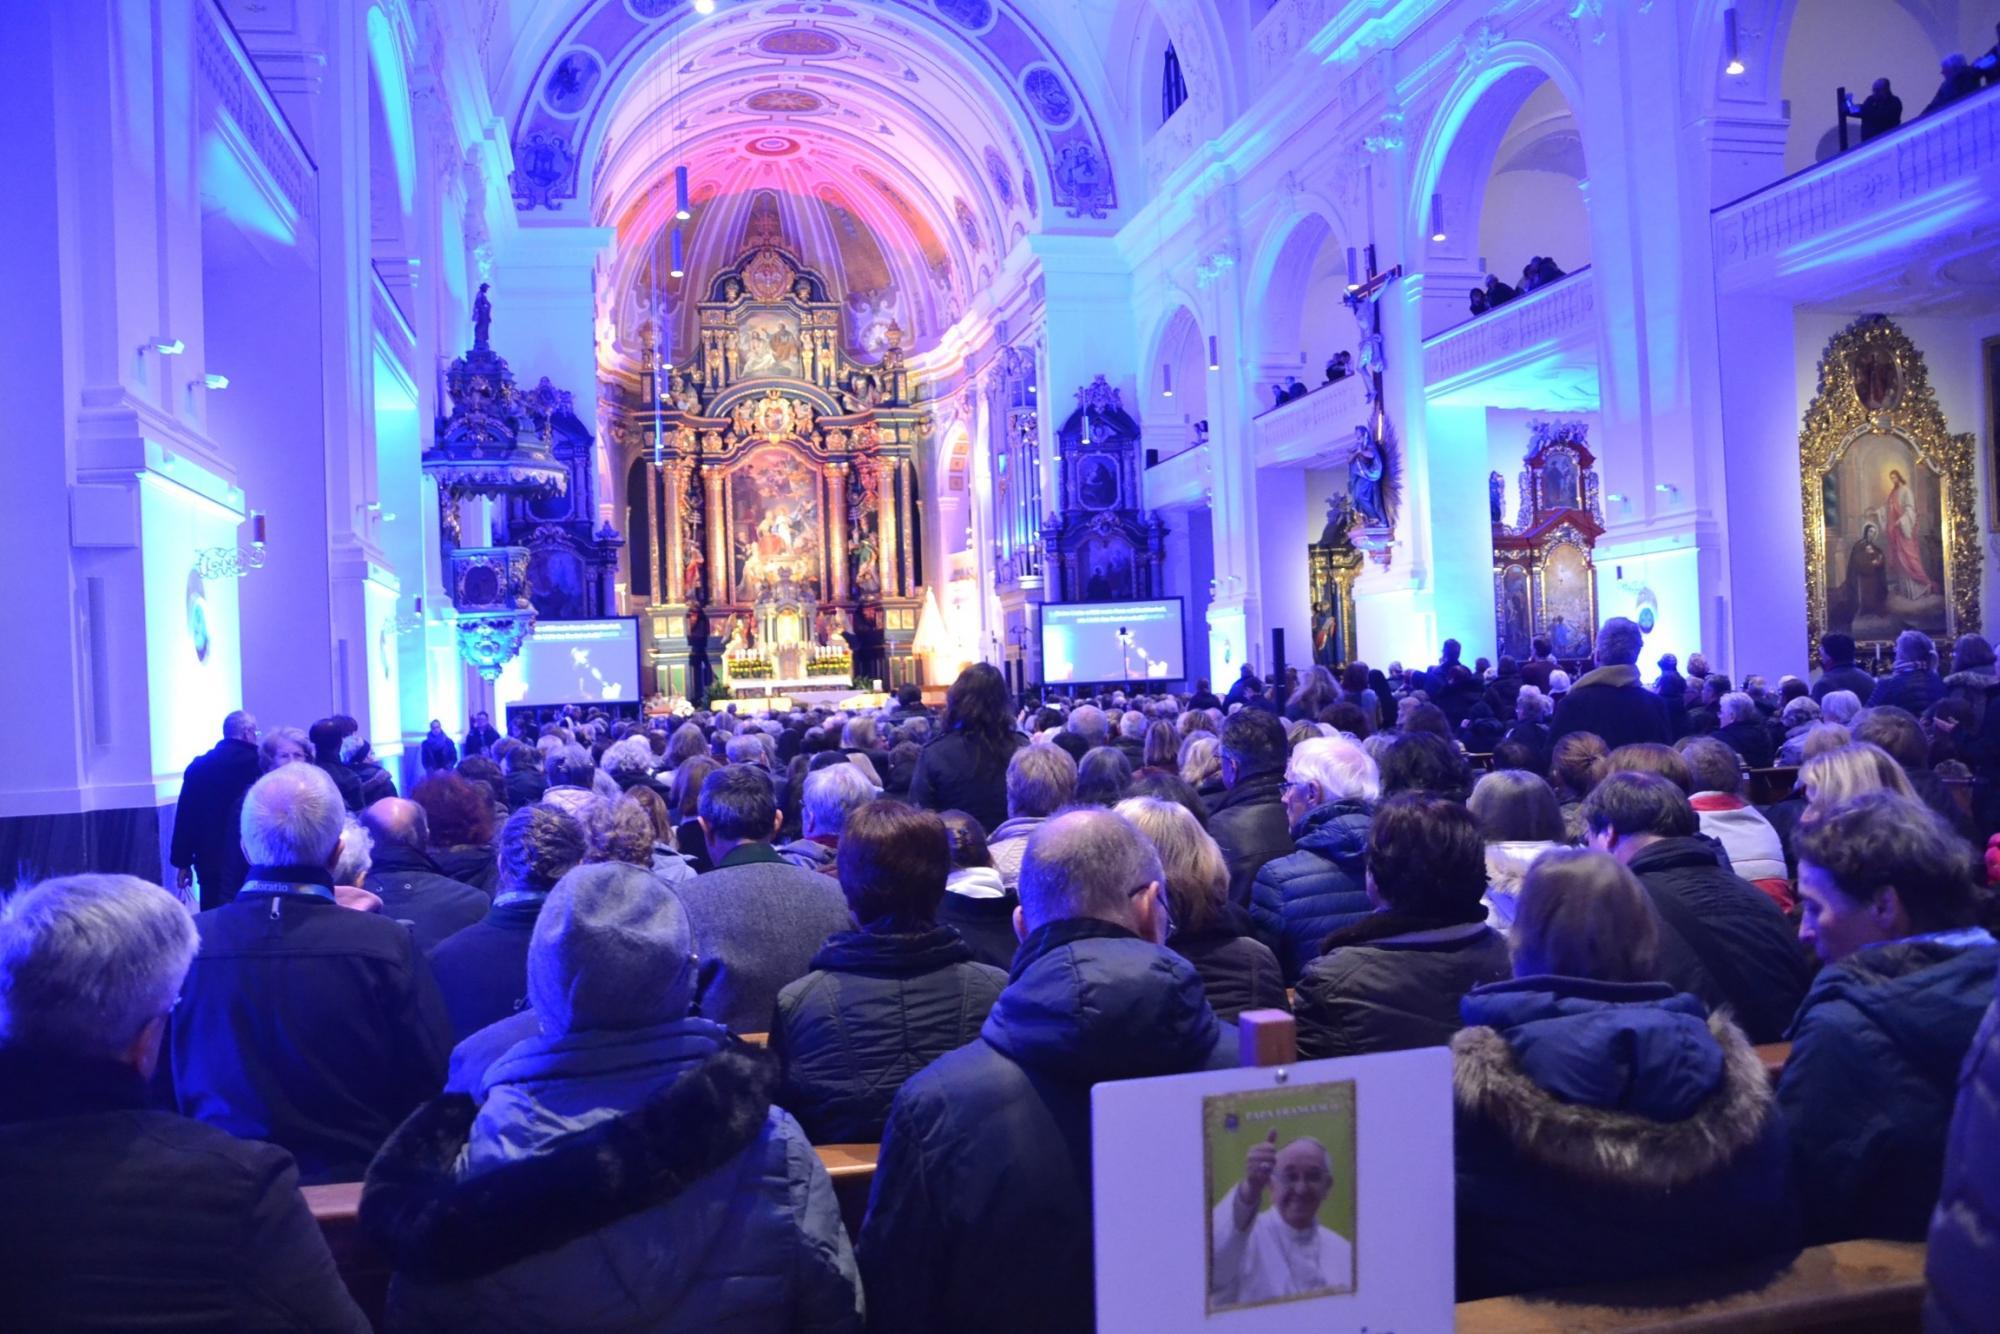 2019-ueber-den-boten-gebetsabend-in-der-basilika